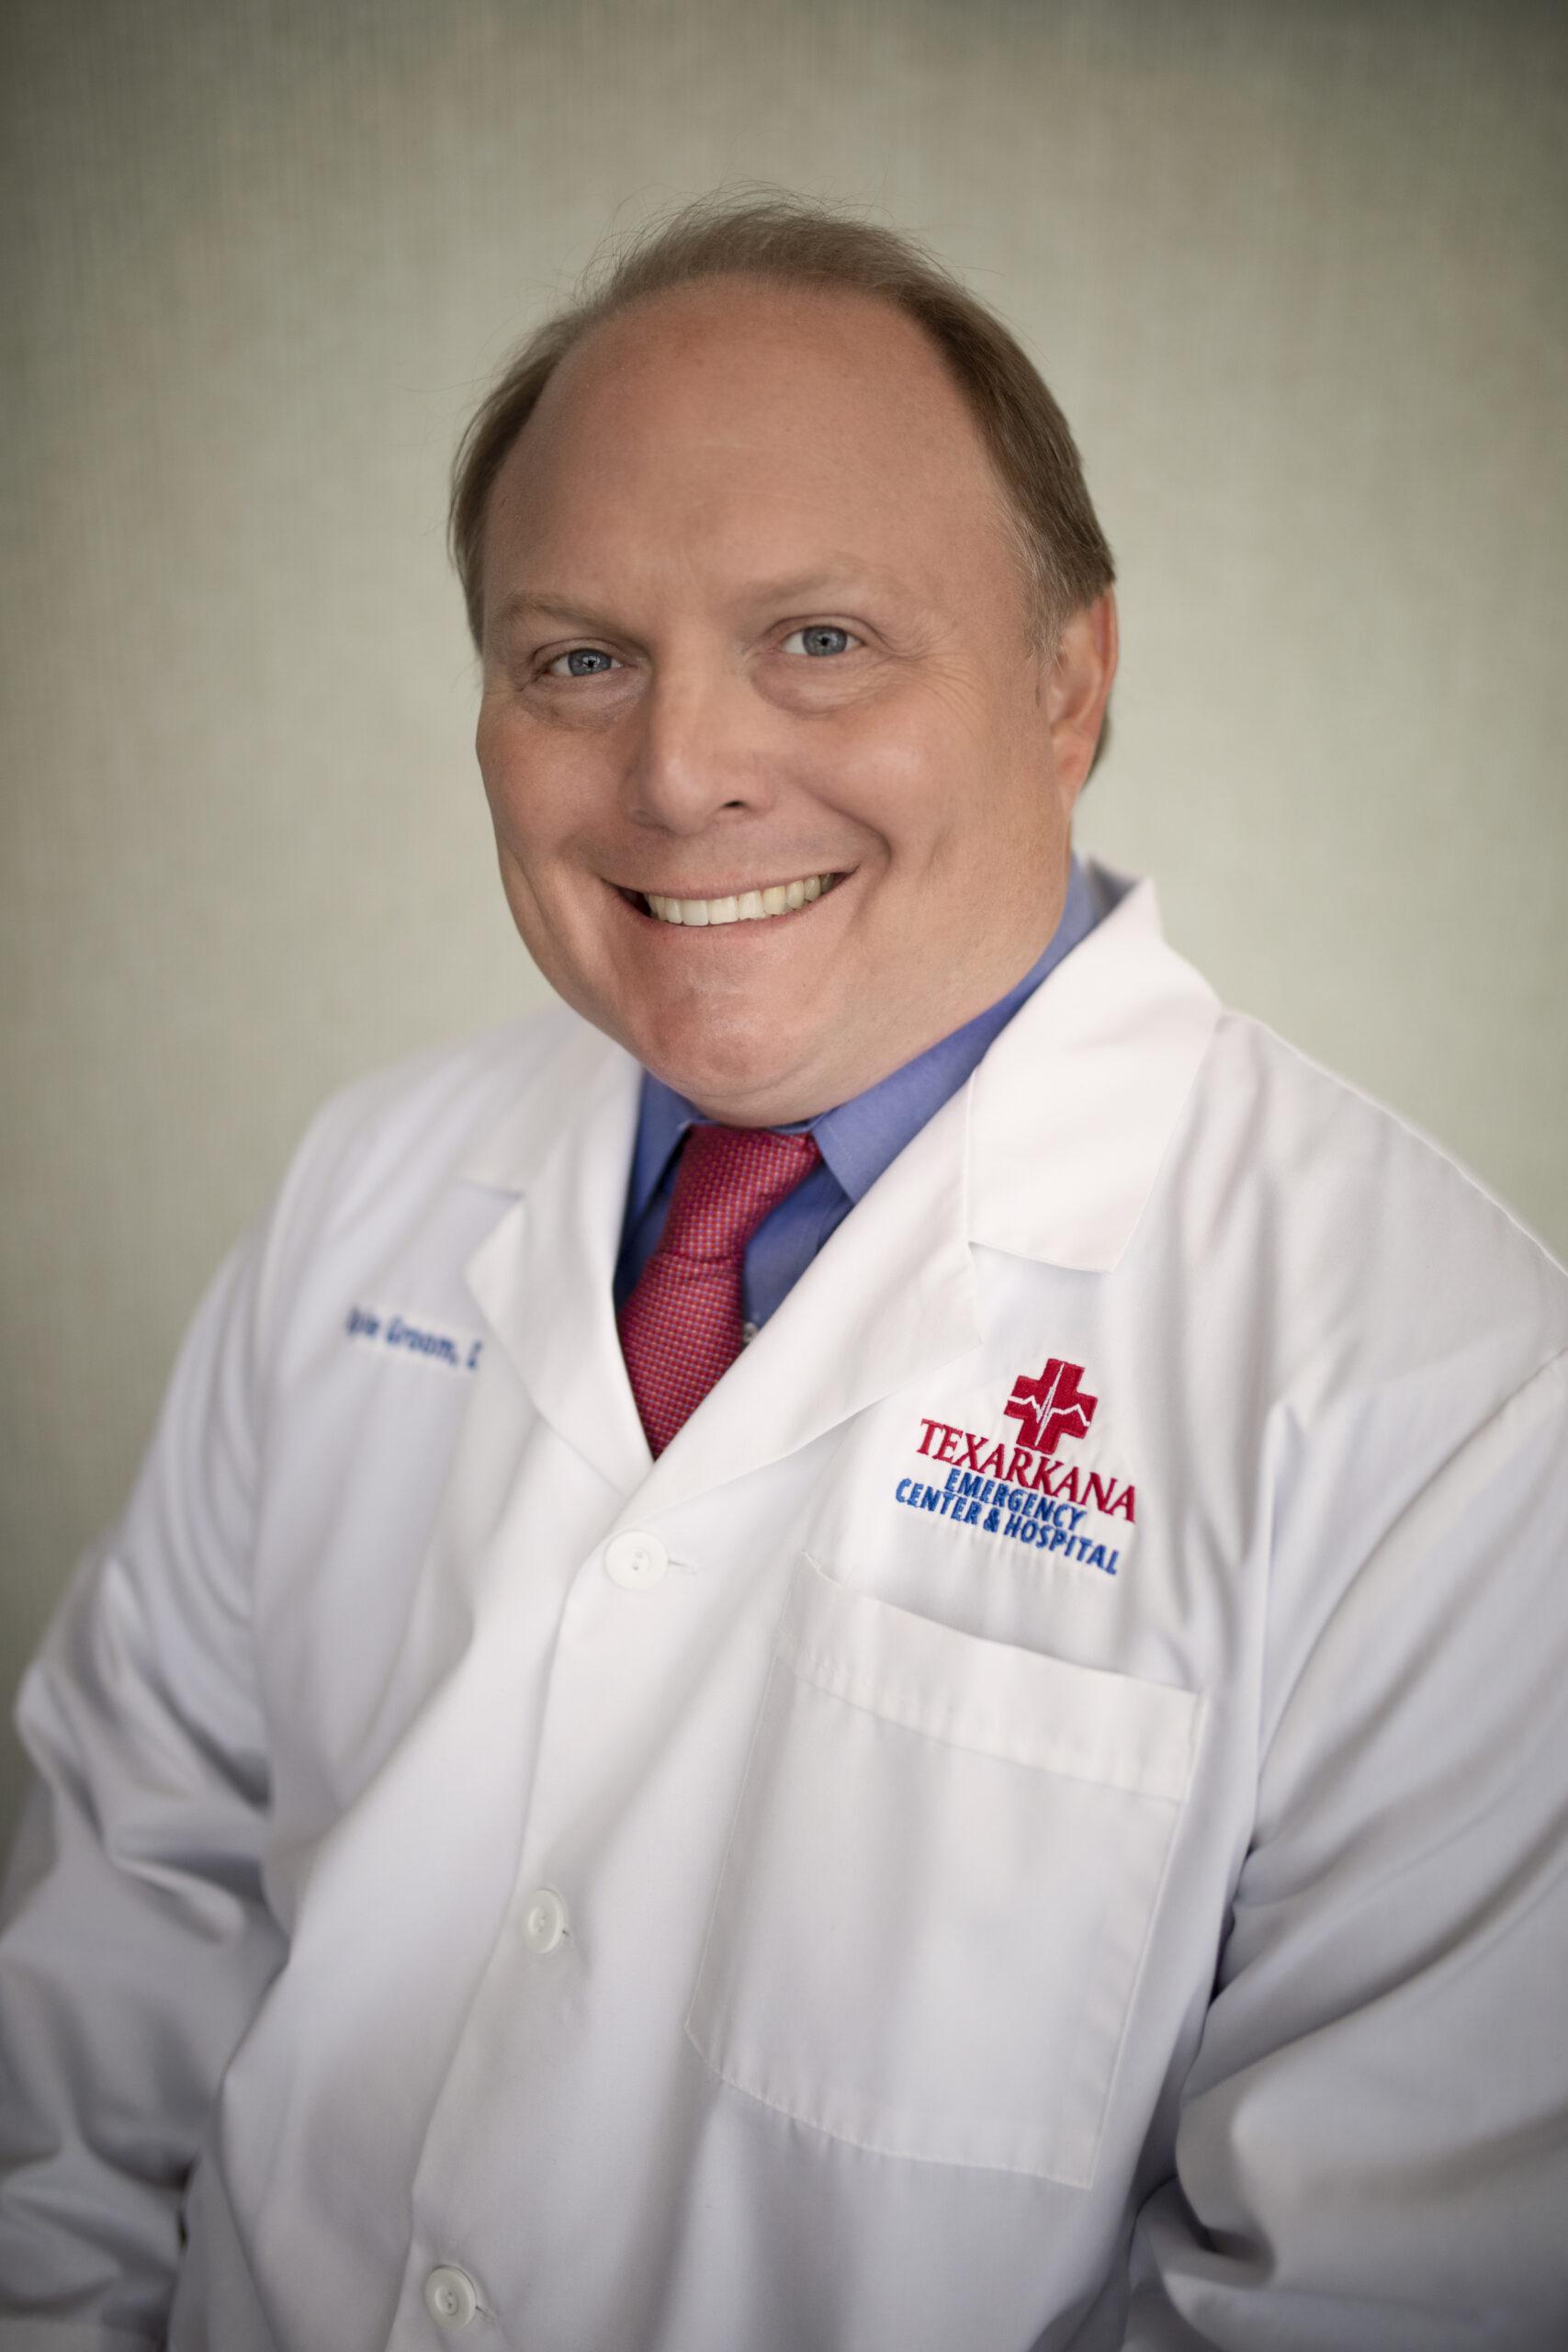 Dr. Kyle Groom